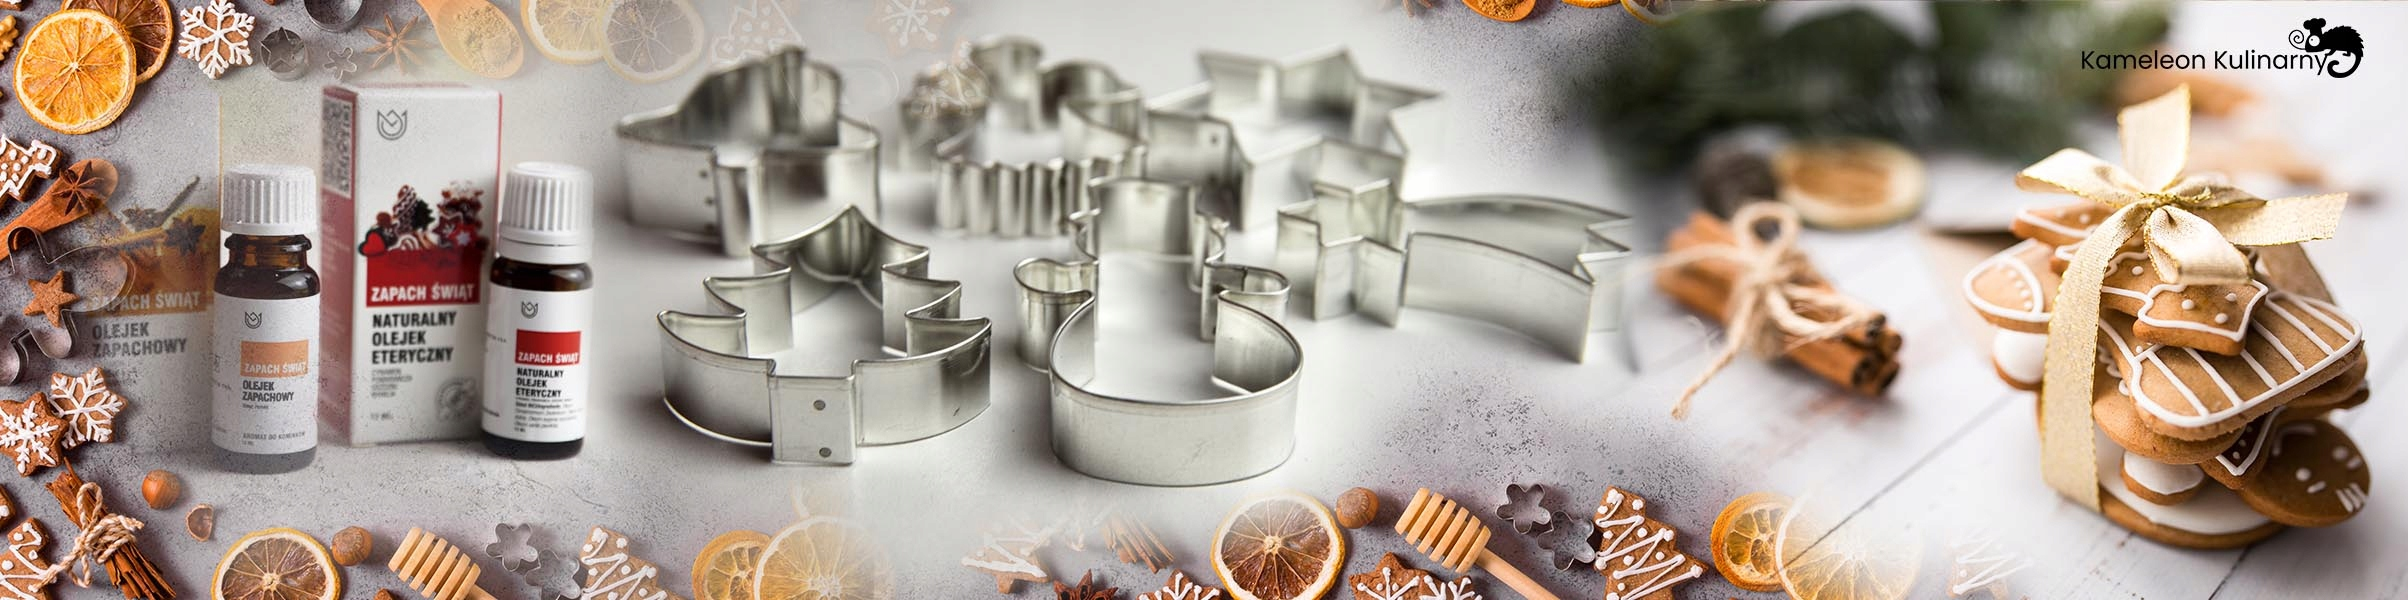 FOREMKA LIS LISEK WYKRAWACZ metalowy D CIASTEK 7,2 Materiał metal